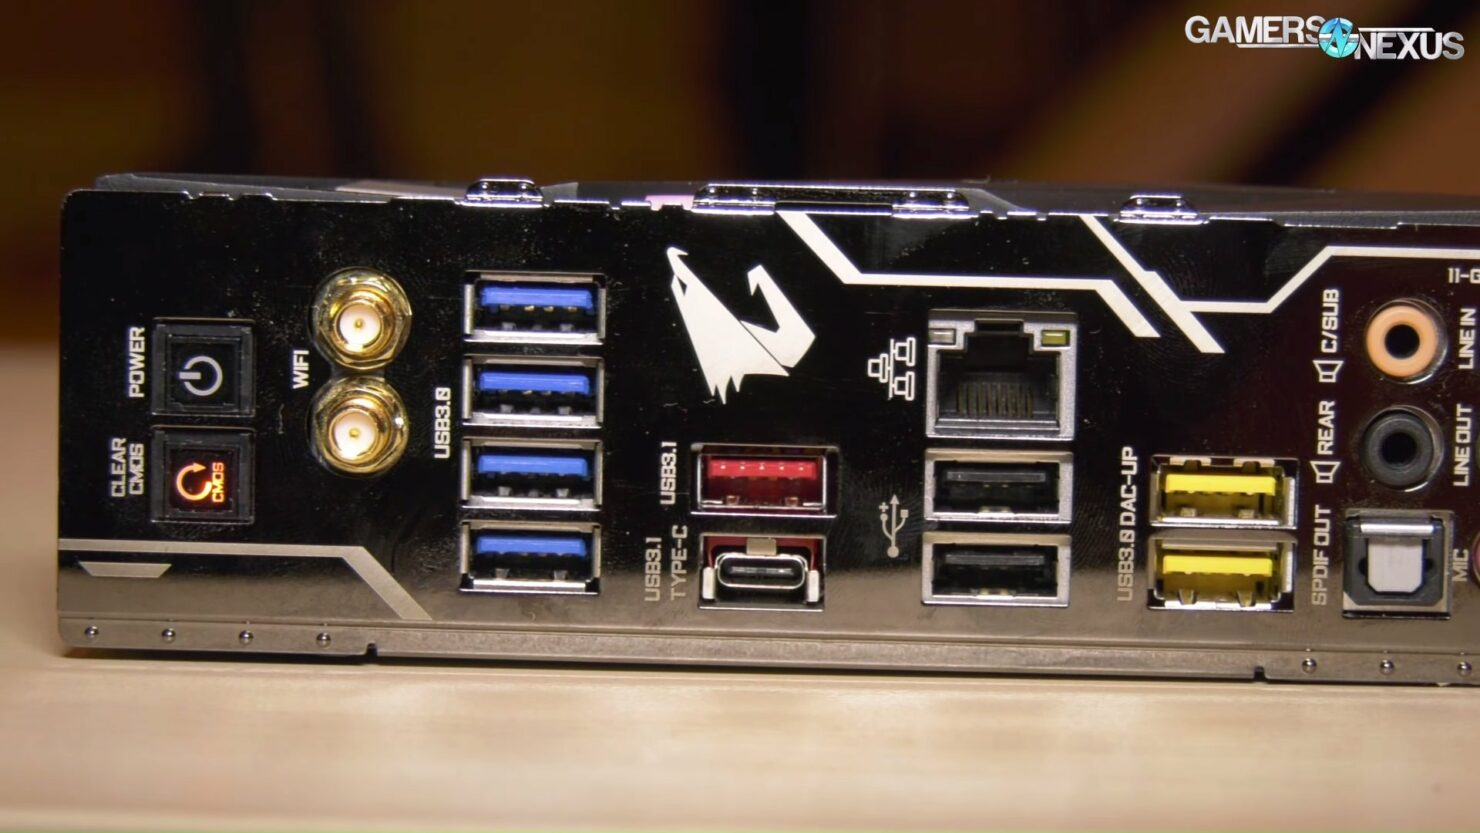 gigabyte-x470-gaming-7-wifi-4